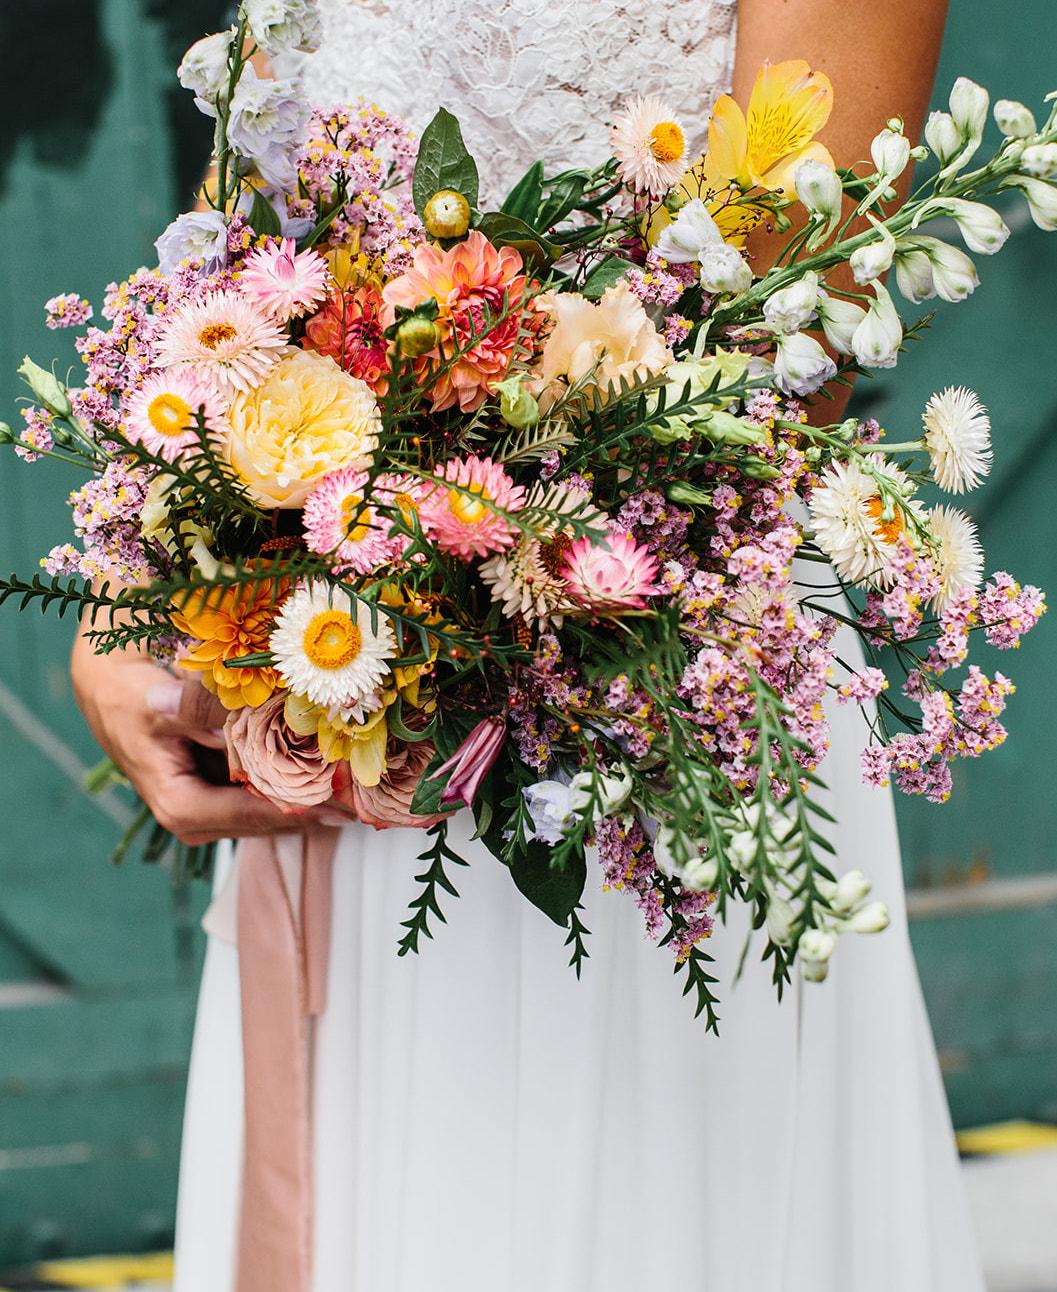 koebenhavns-plantefarveri-for-pretty-day-flowers-wedding-boquet-silk-ribbons-camilla-kirk-.jpg